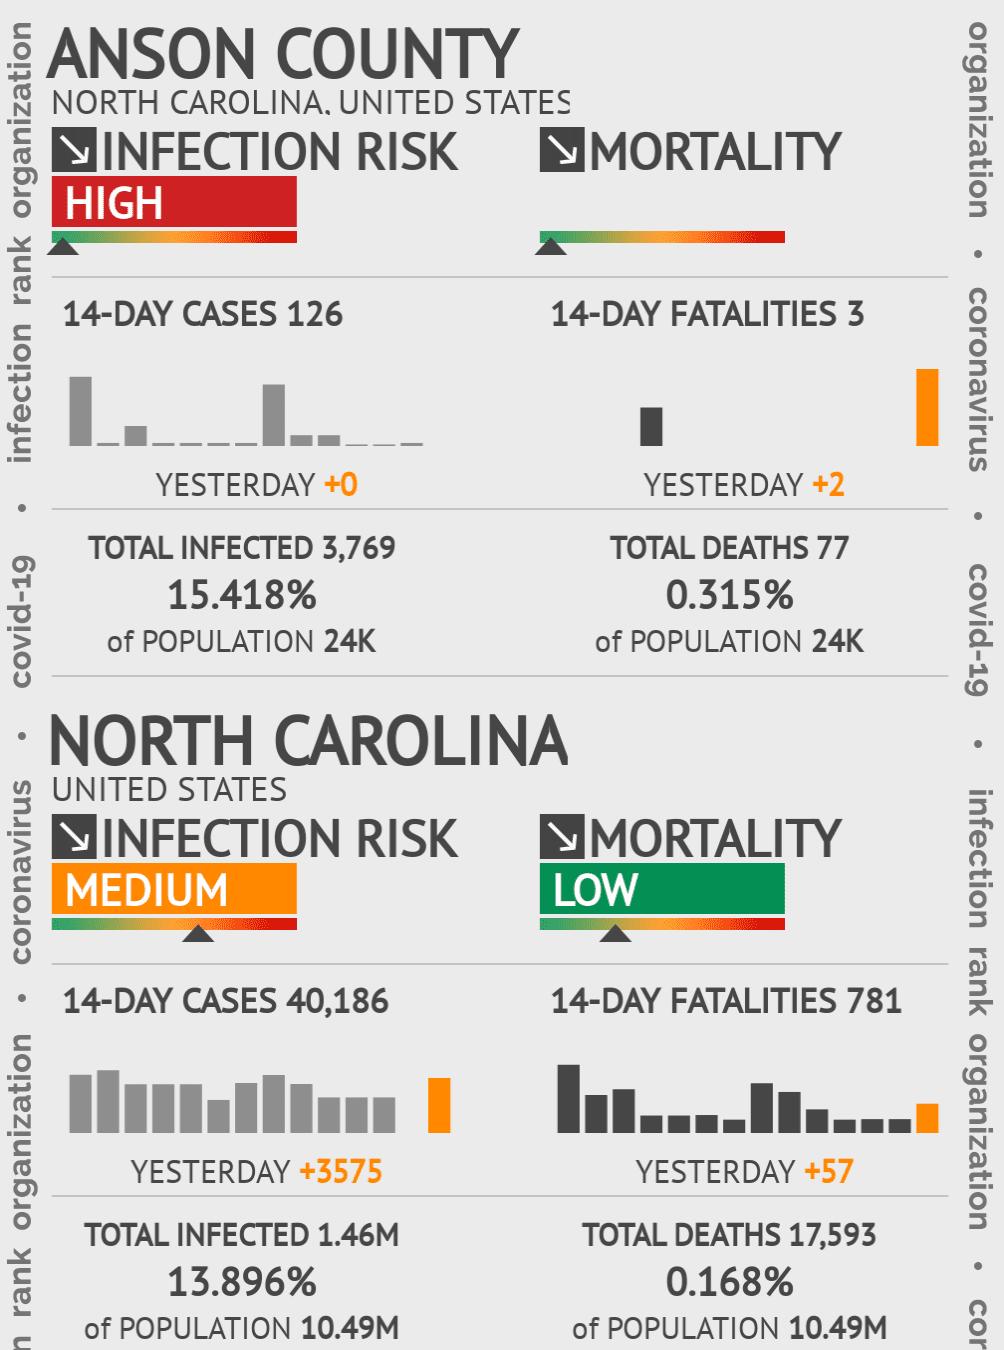 Anson County Coronavirus Covid-19 Risk of Infection on November 27, 2020